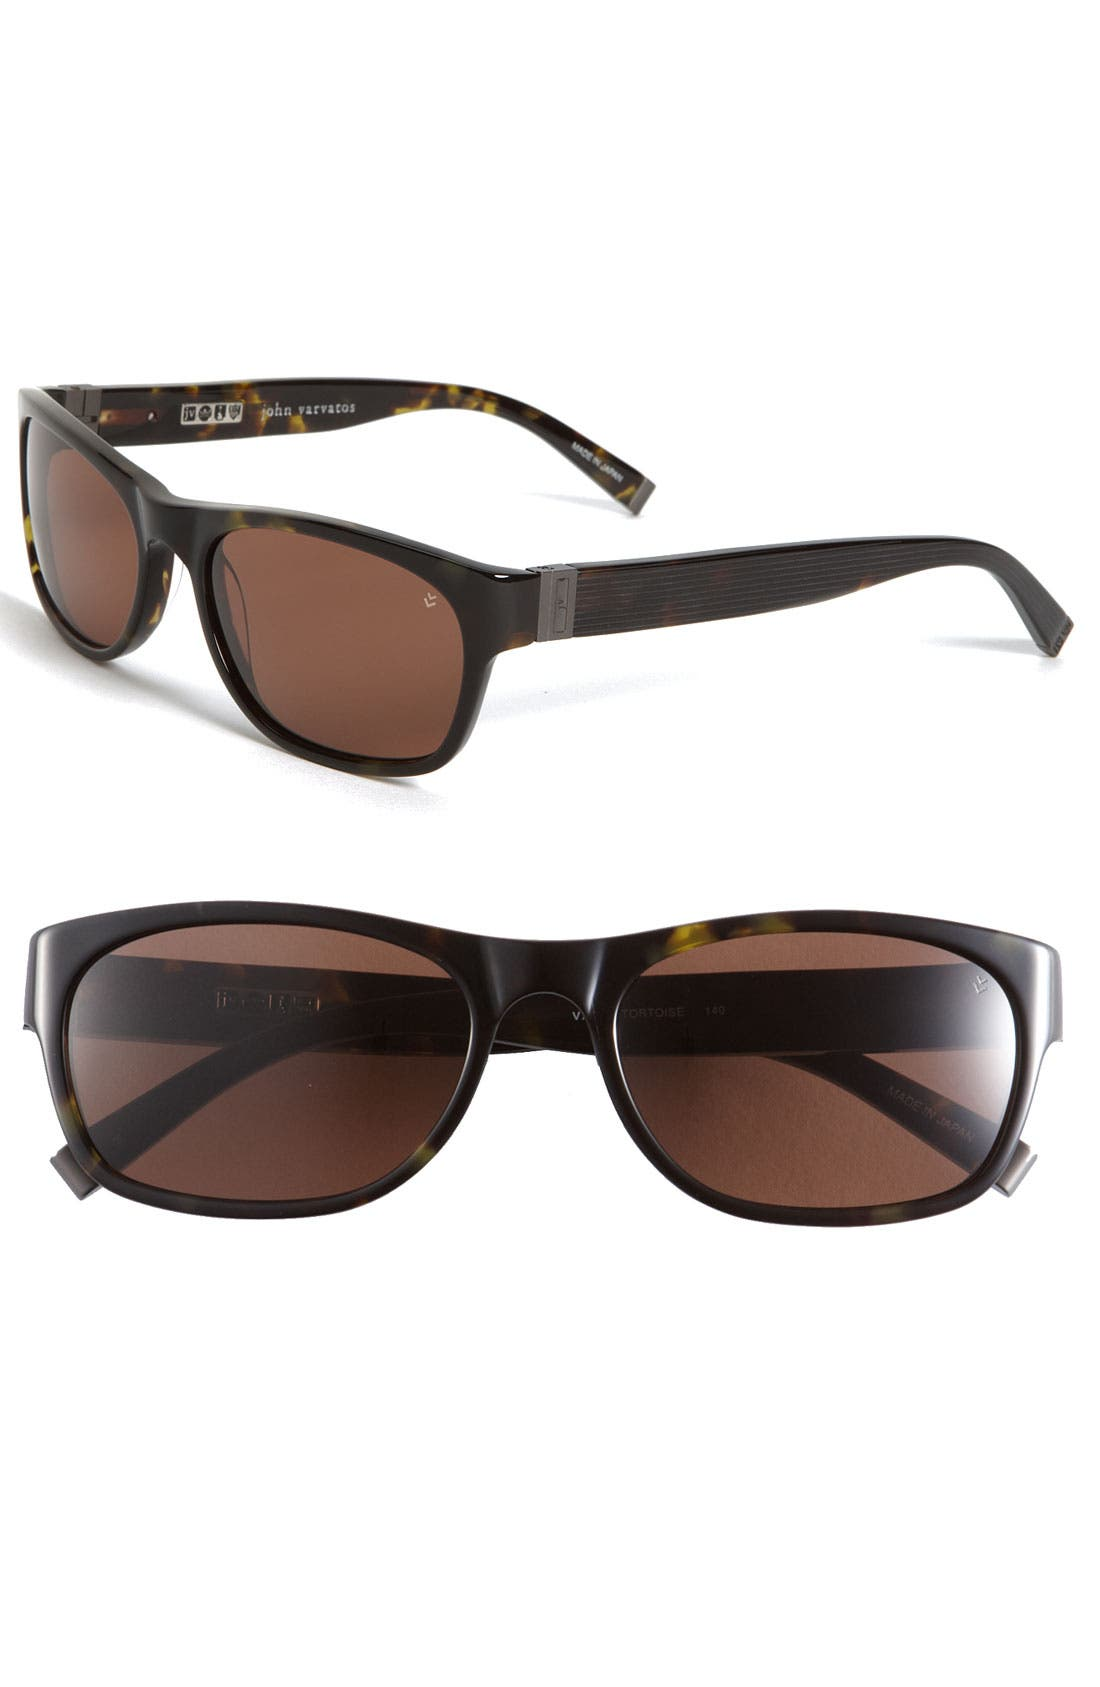 Alternate Image 1 Selected - John Varvatos Collection 'Swirl' Plastic Sunglasses